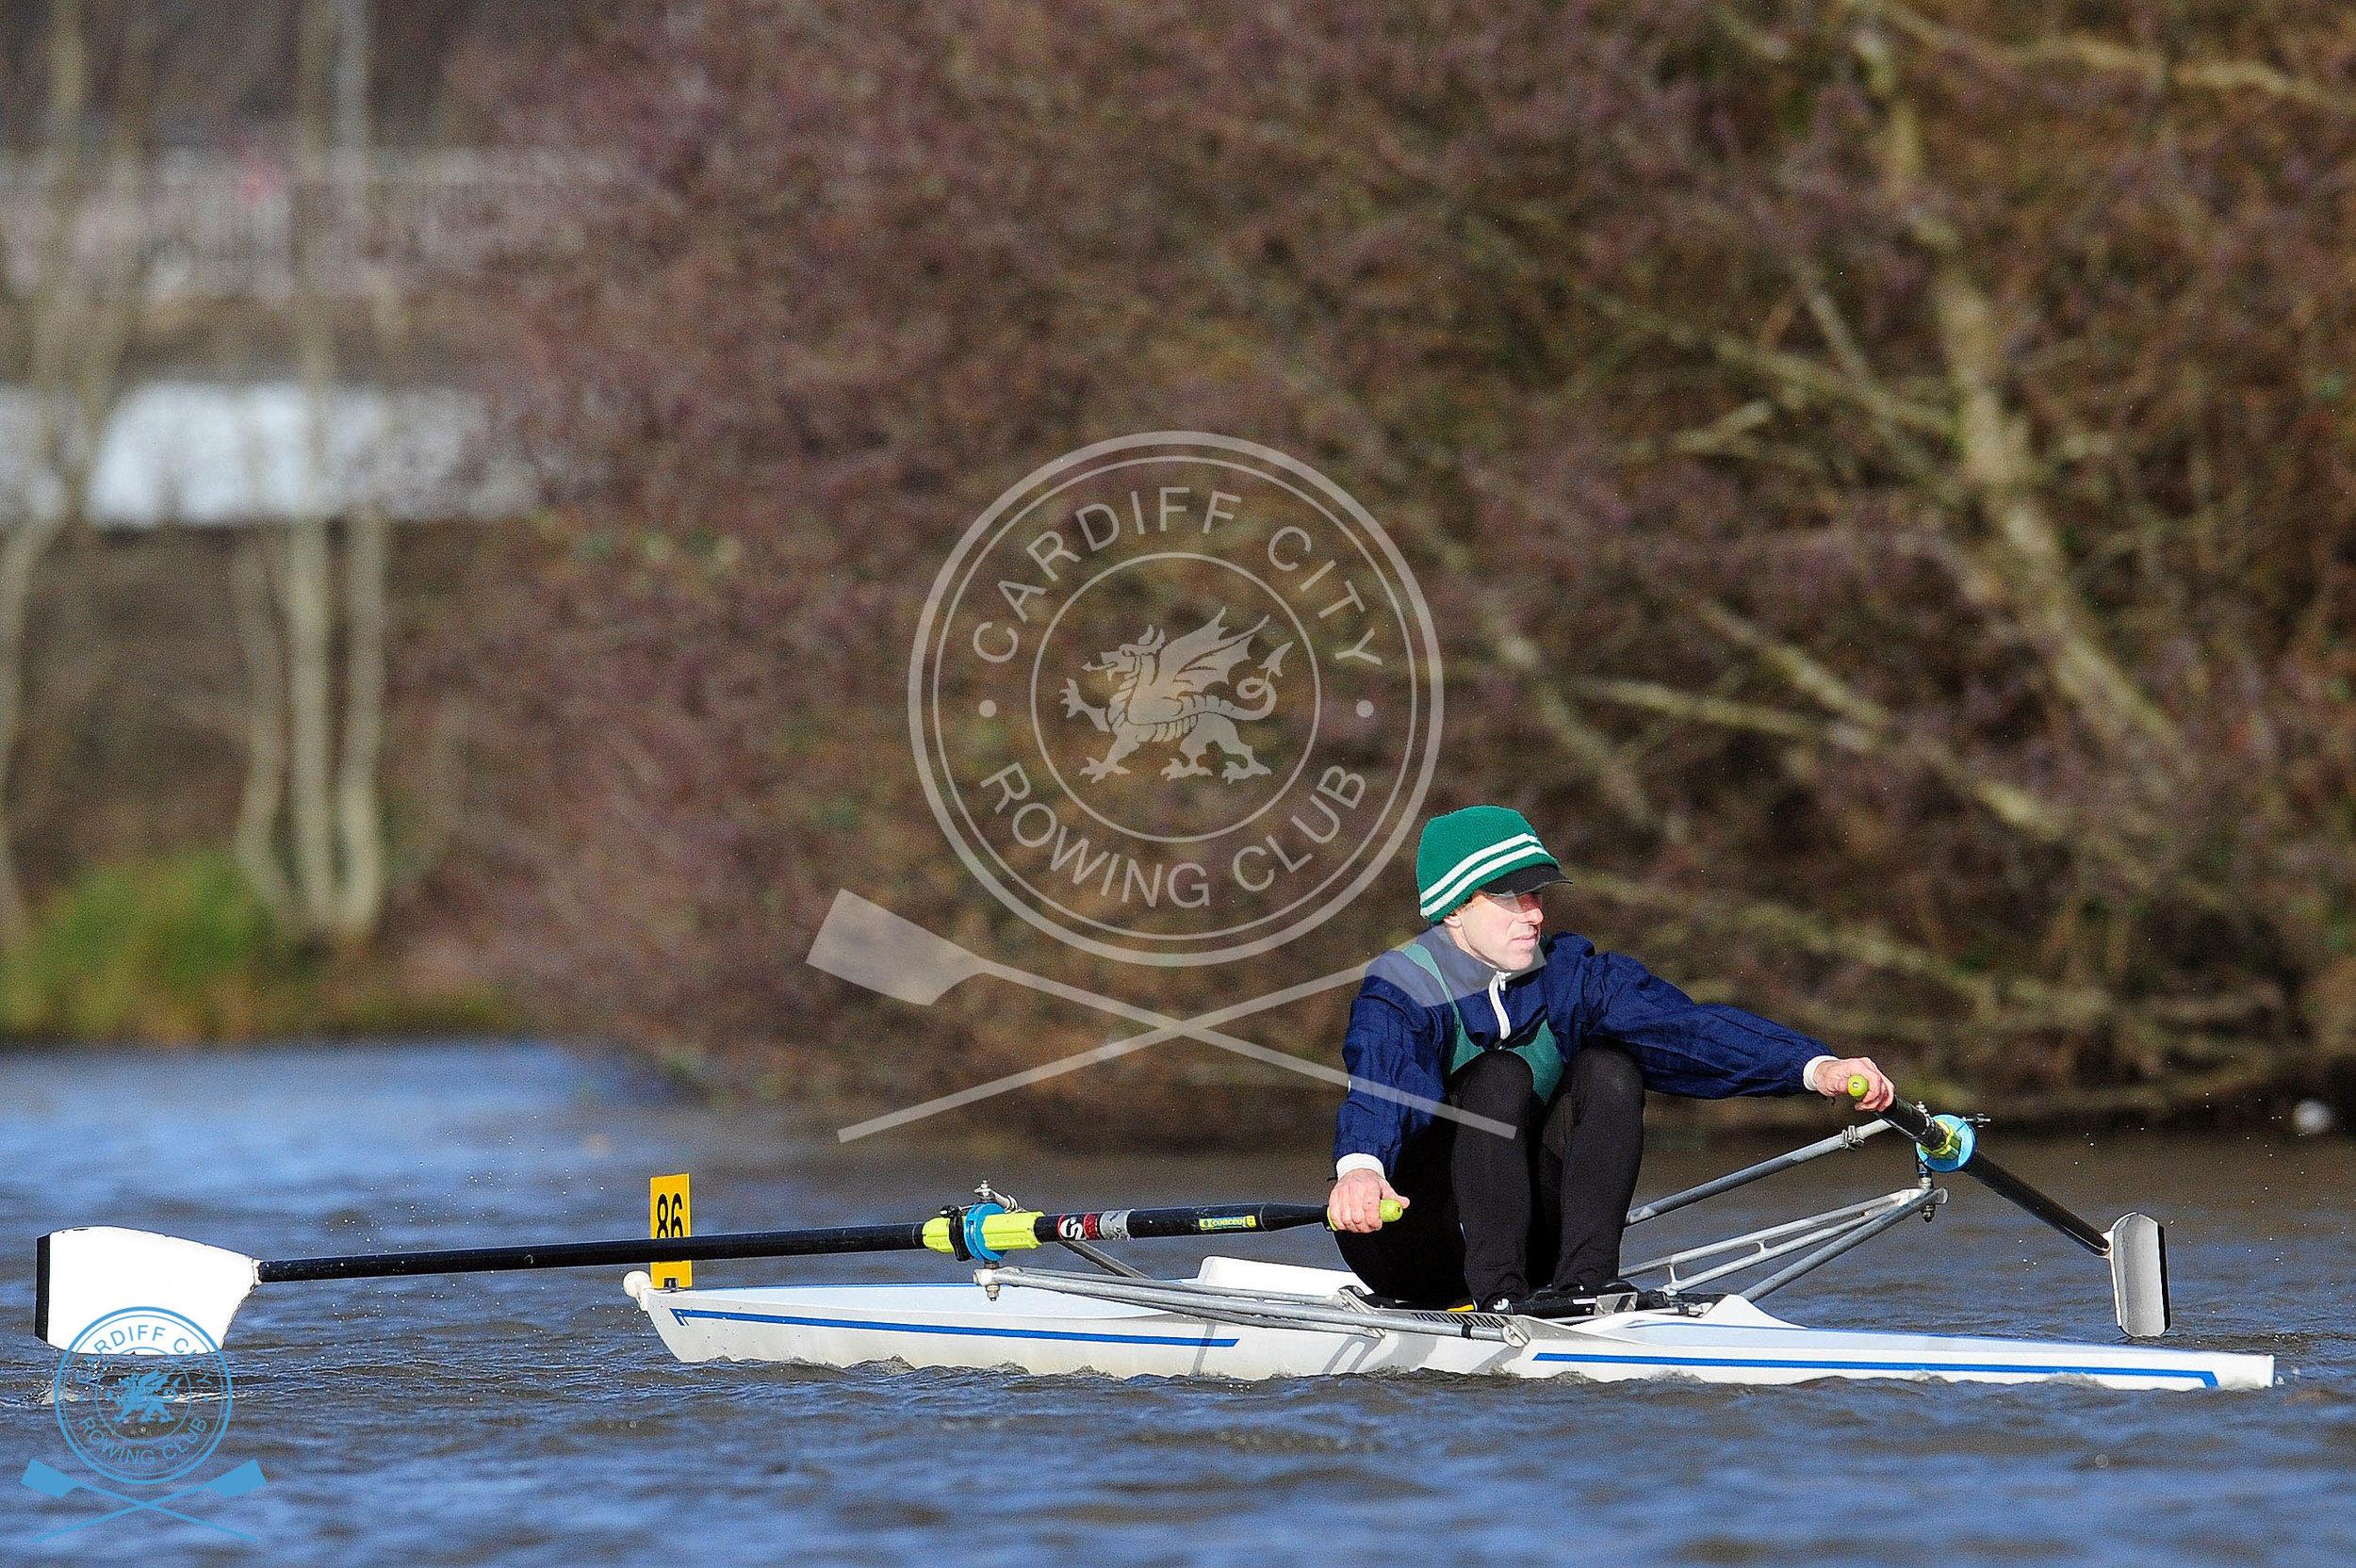 DW_280119_Cardiff_City_Rowing_204.jpg